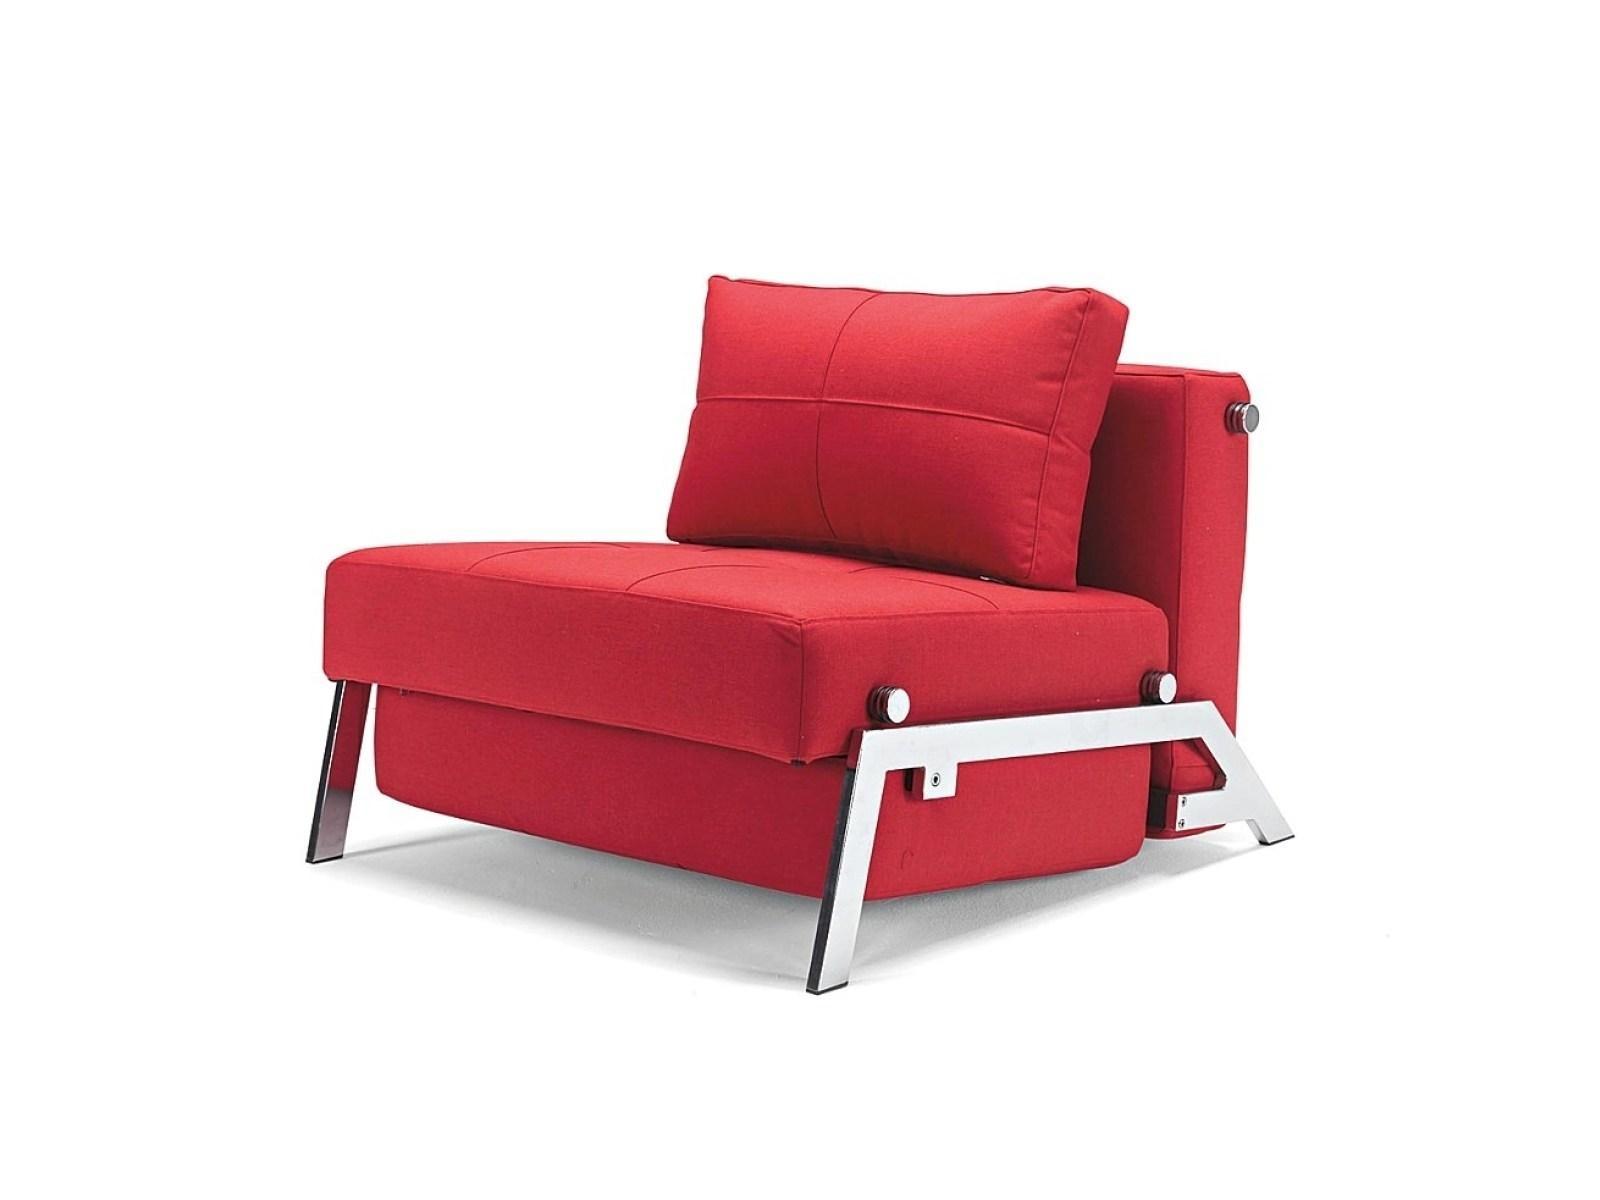 ▻ Sofa : 21 Wonderful Futon White Mattress Design Decor Futons Pertaining To Single Chair Sofa Bed (Image 2 of 20)